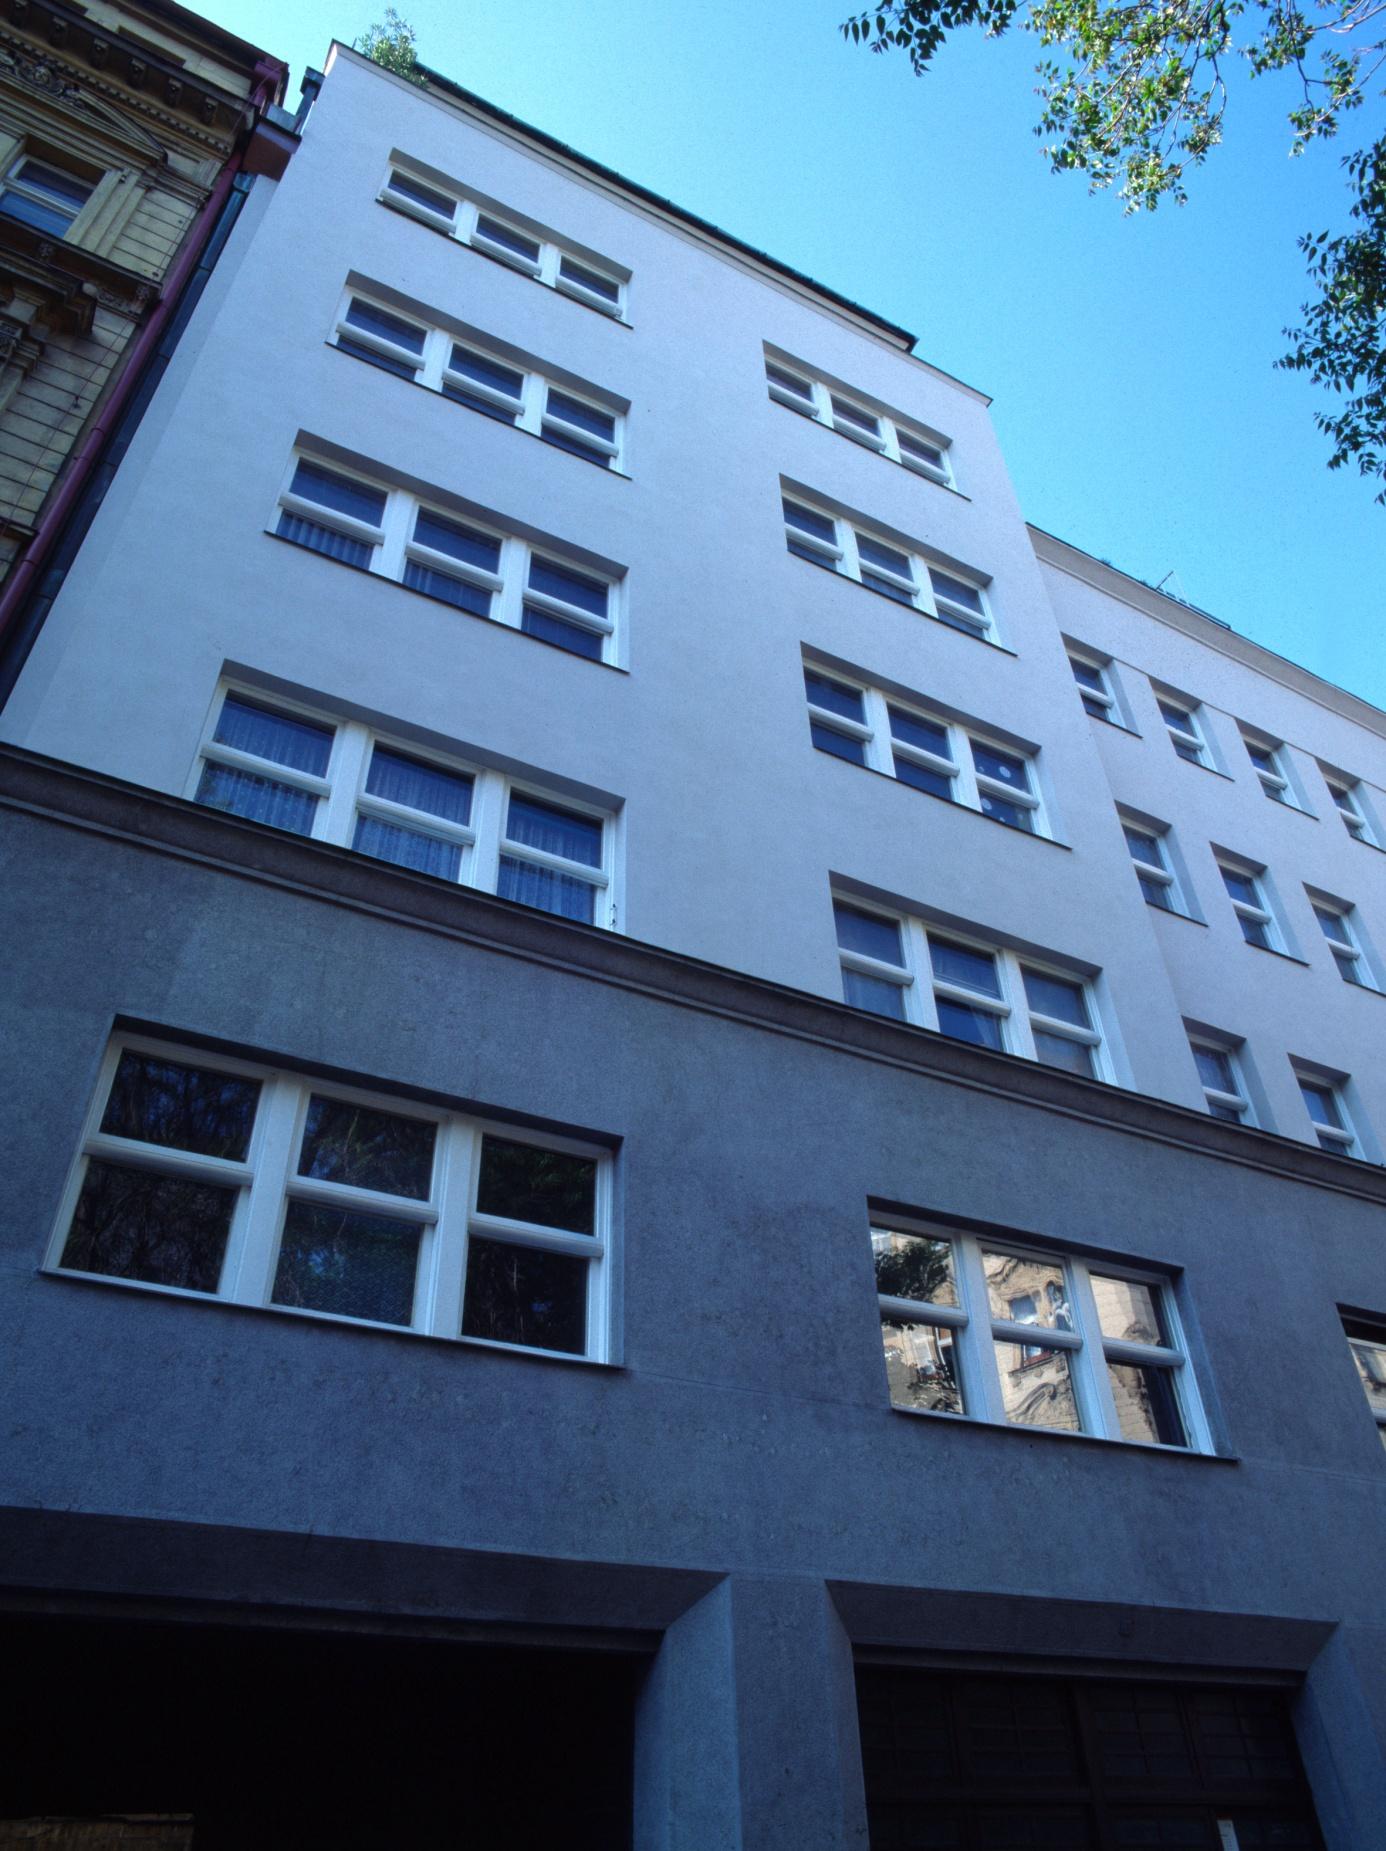 Betlémská, Praha 1